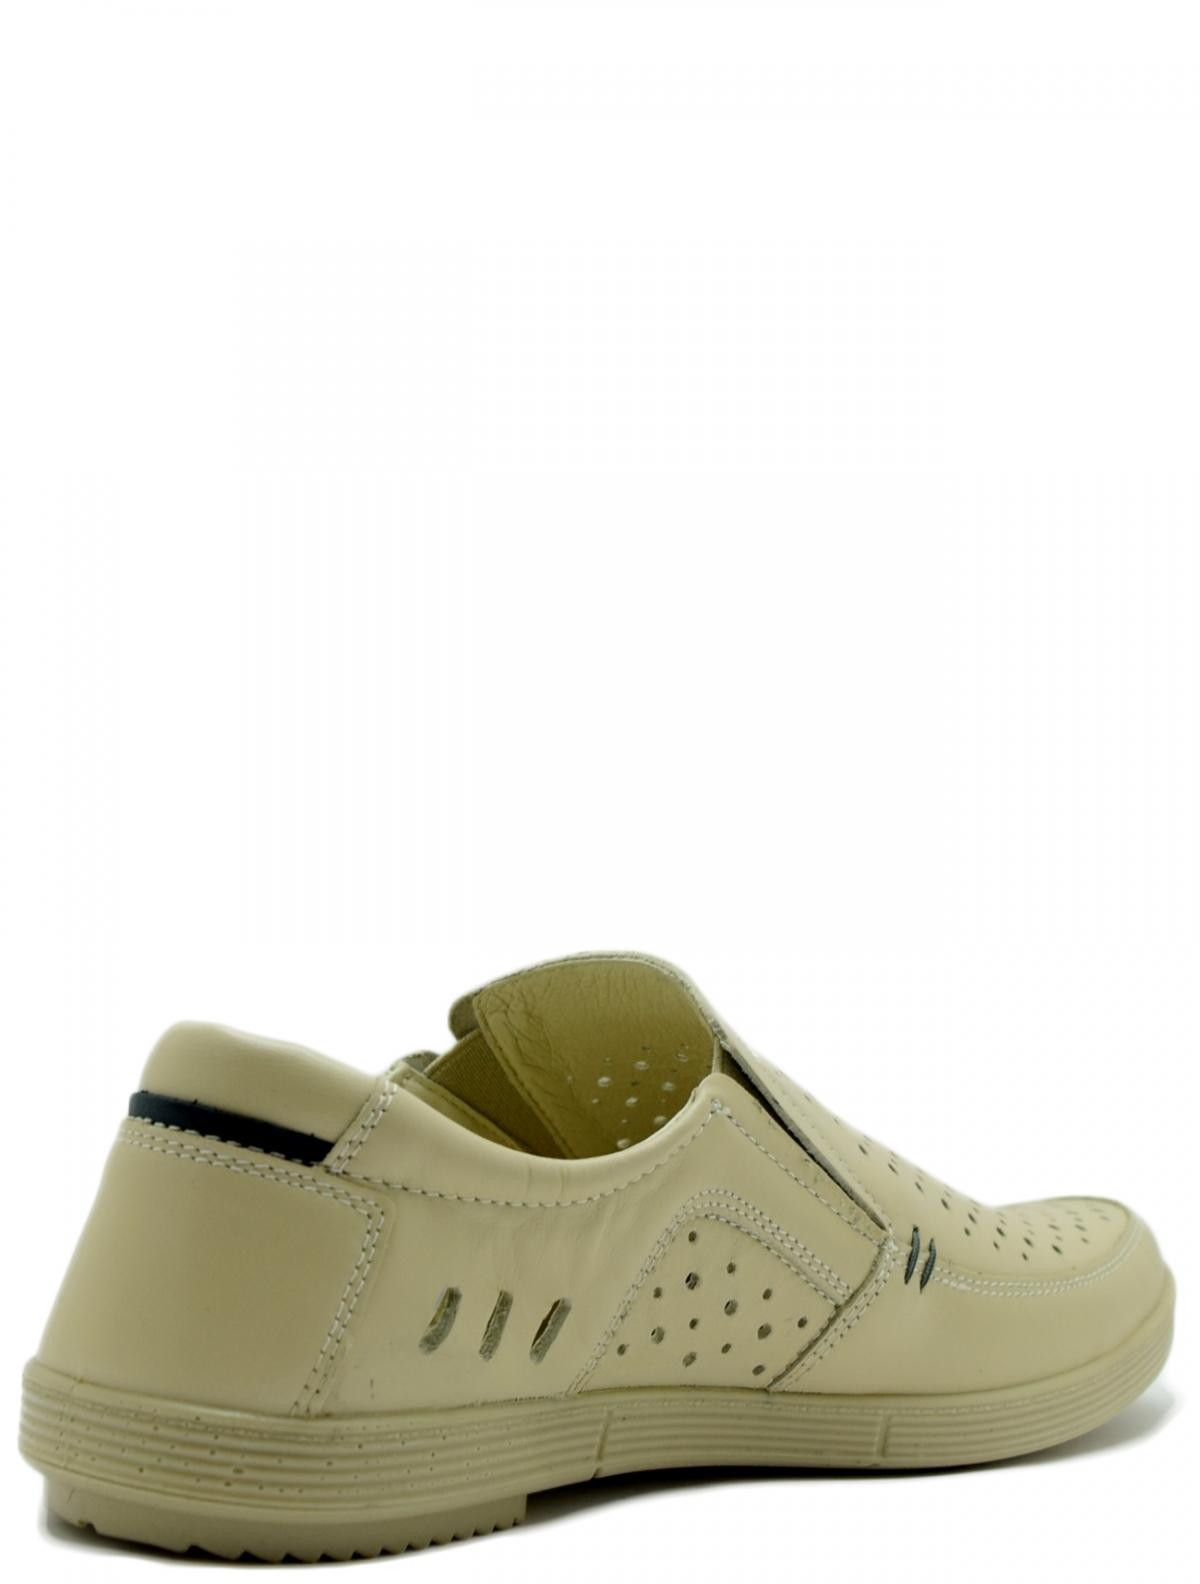 Marko 44103 мужские туфли